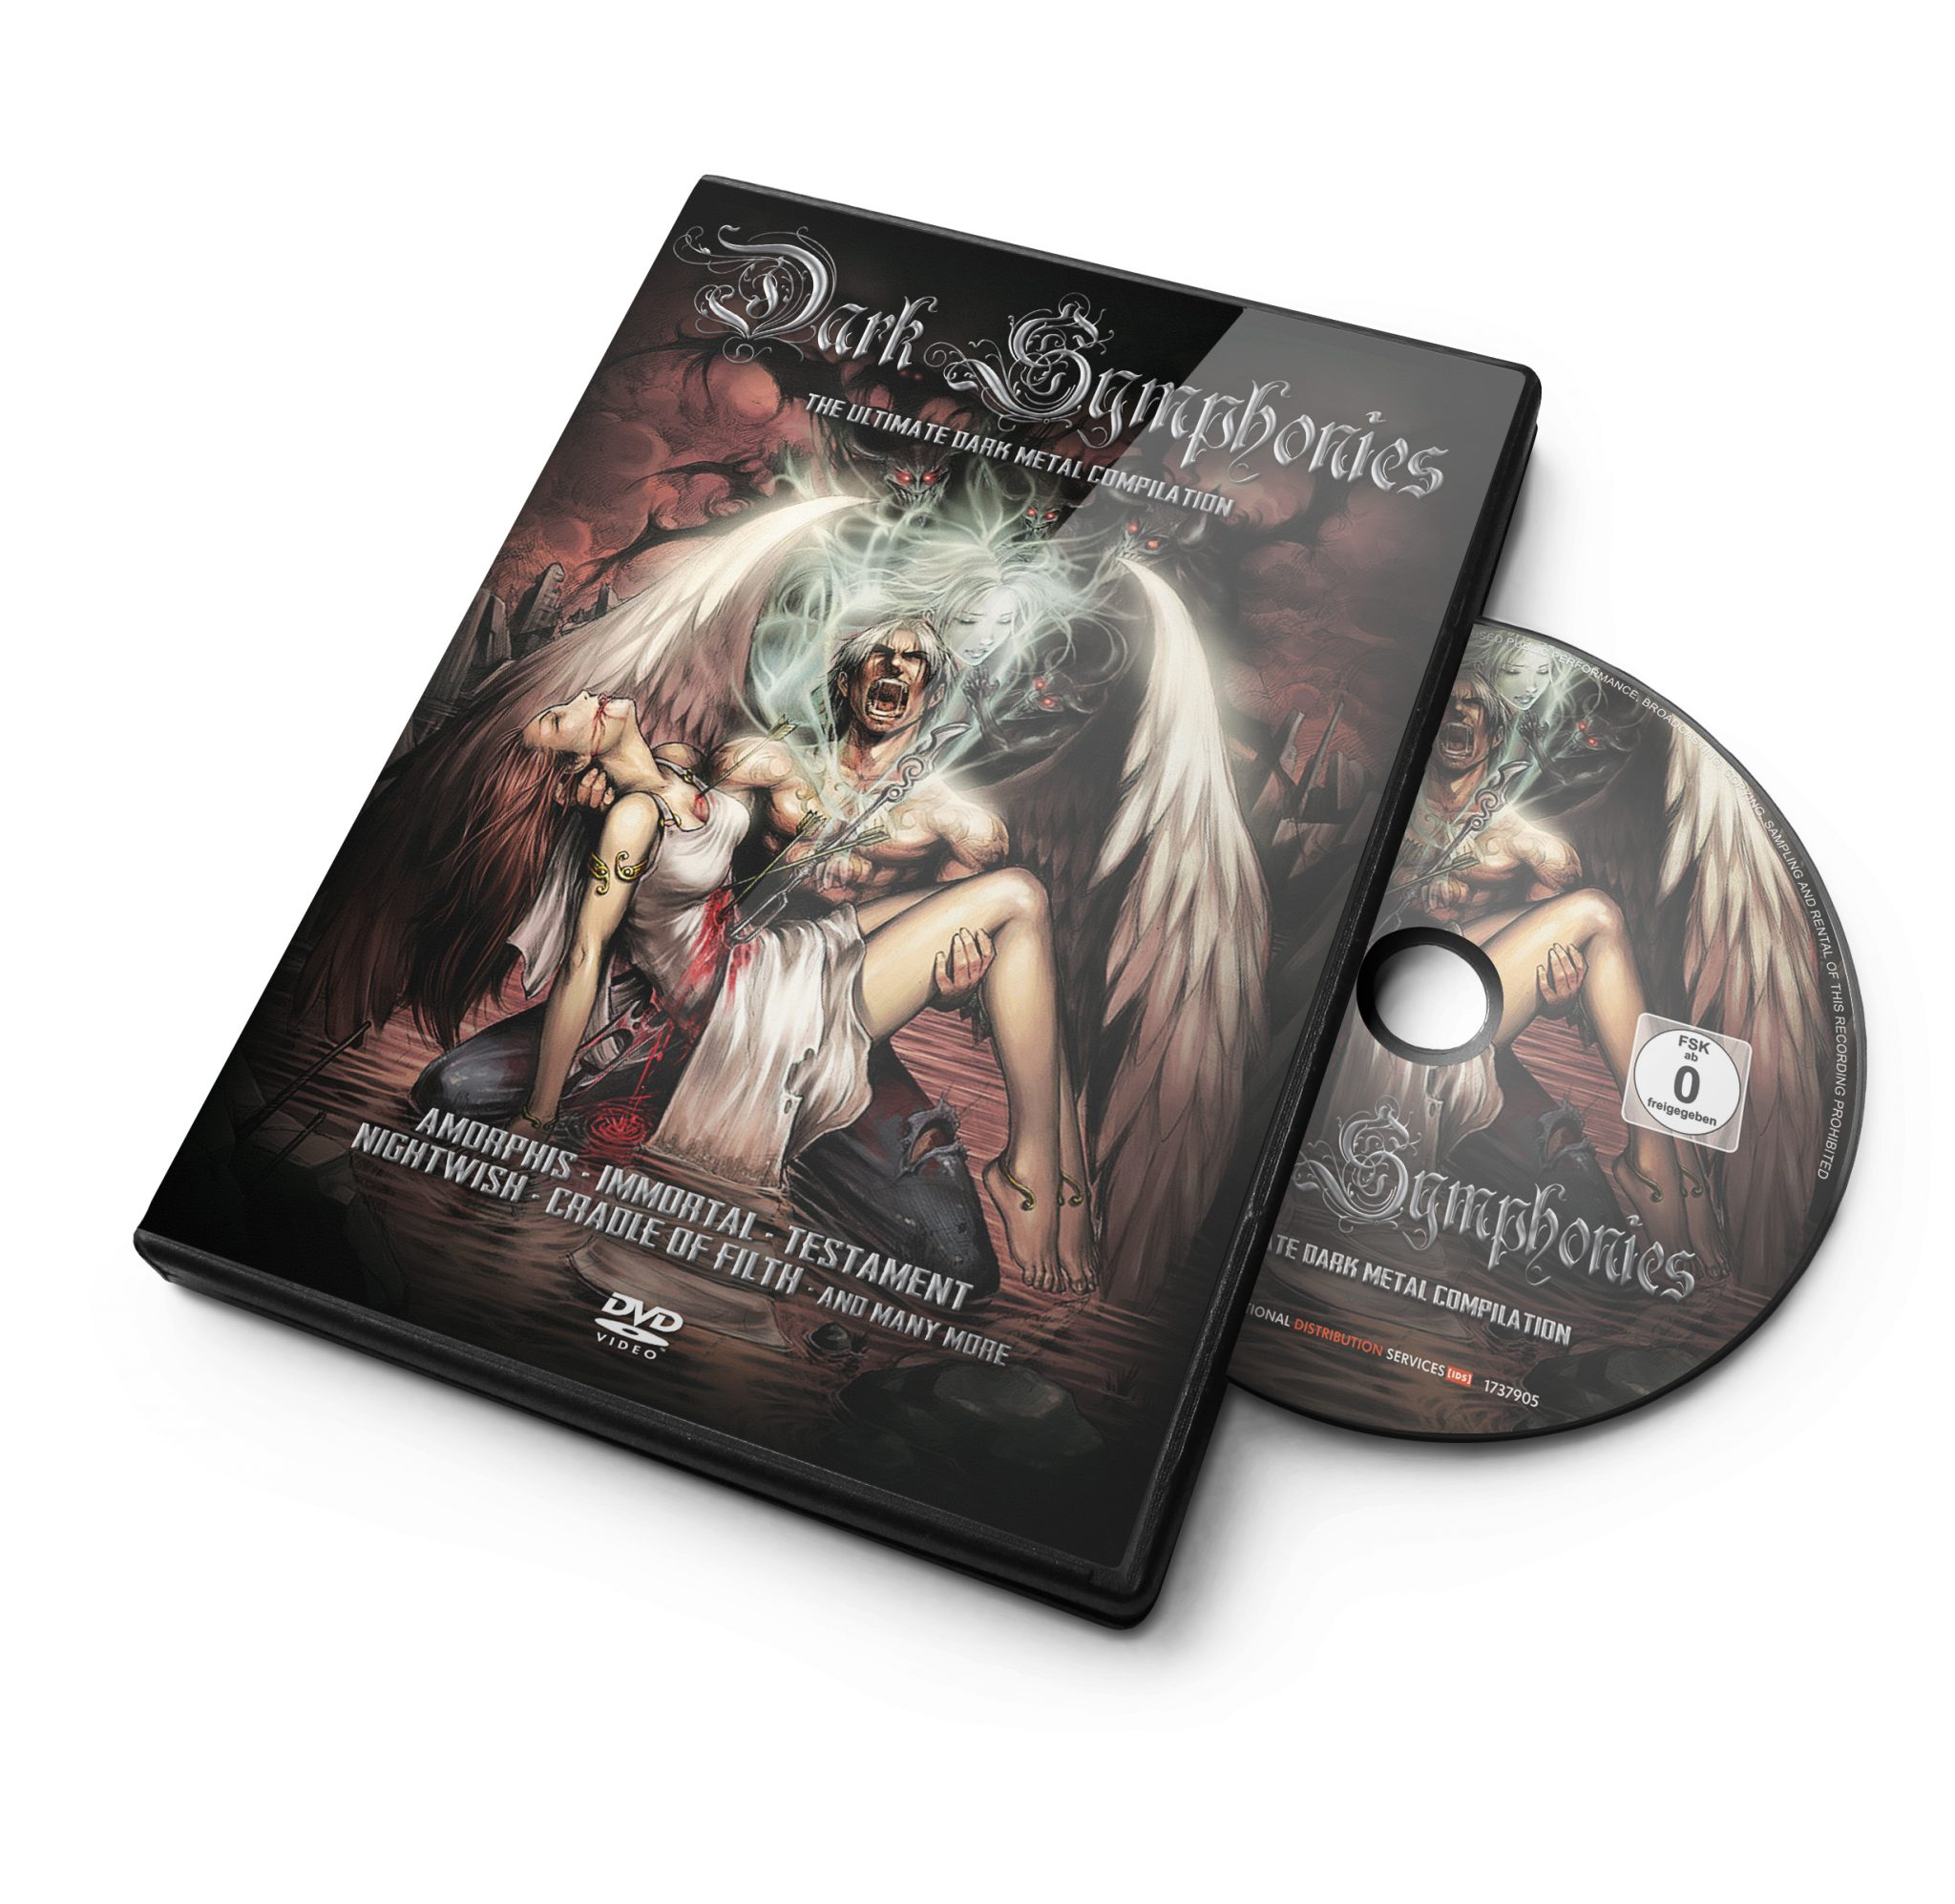 dark symphonies_dvd